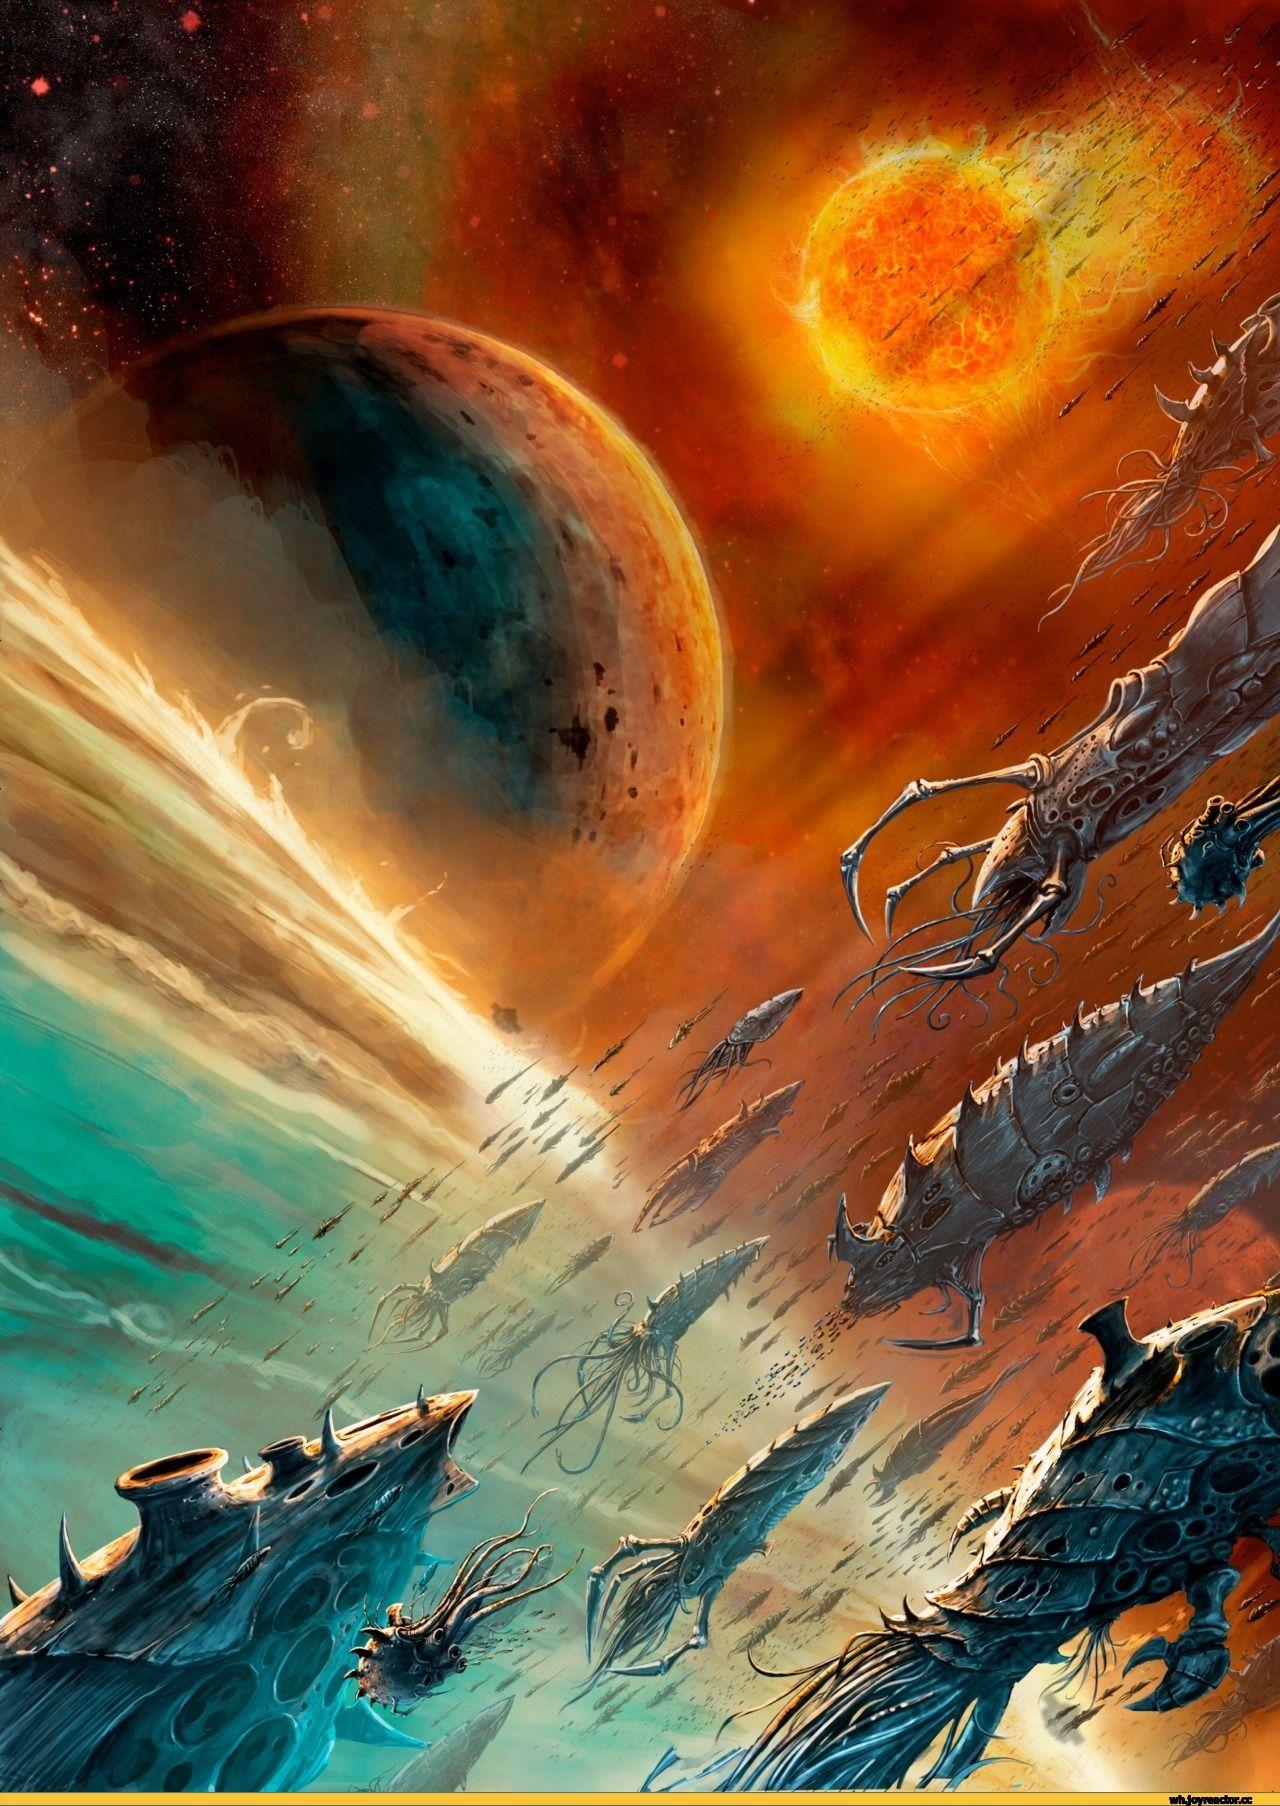 56 Best Tyranid Art images   Tyranids, Warhammer 40k art ...